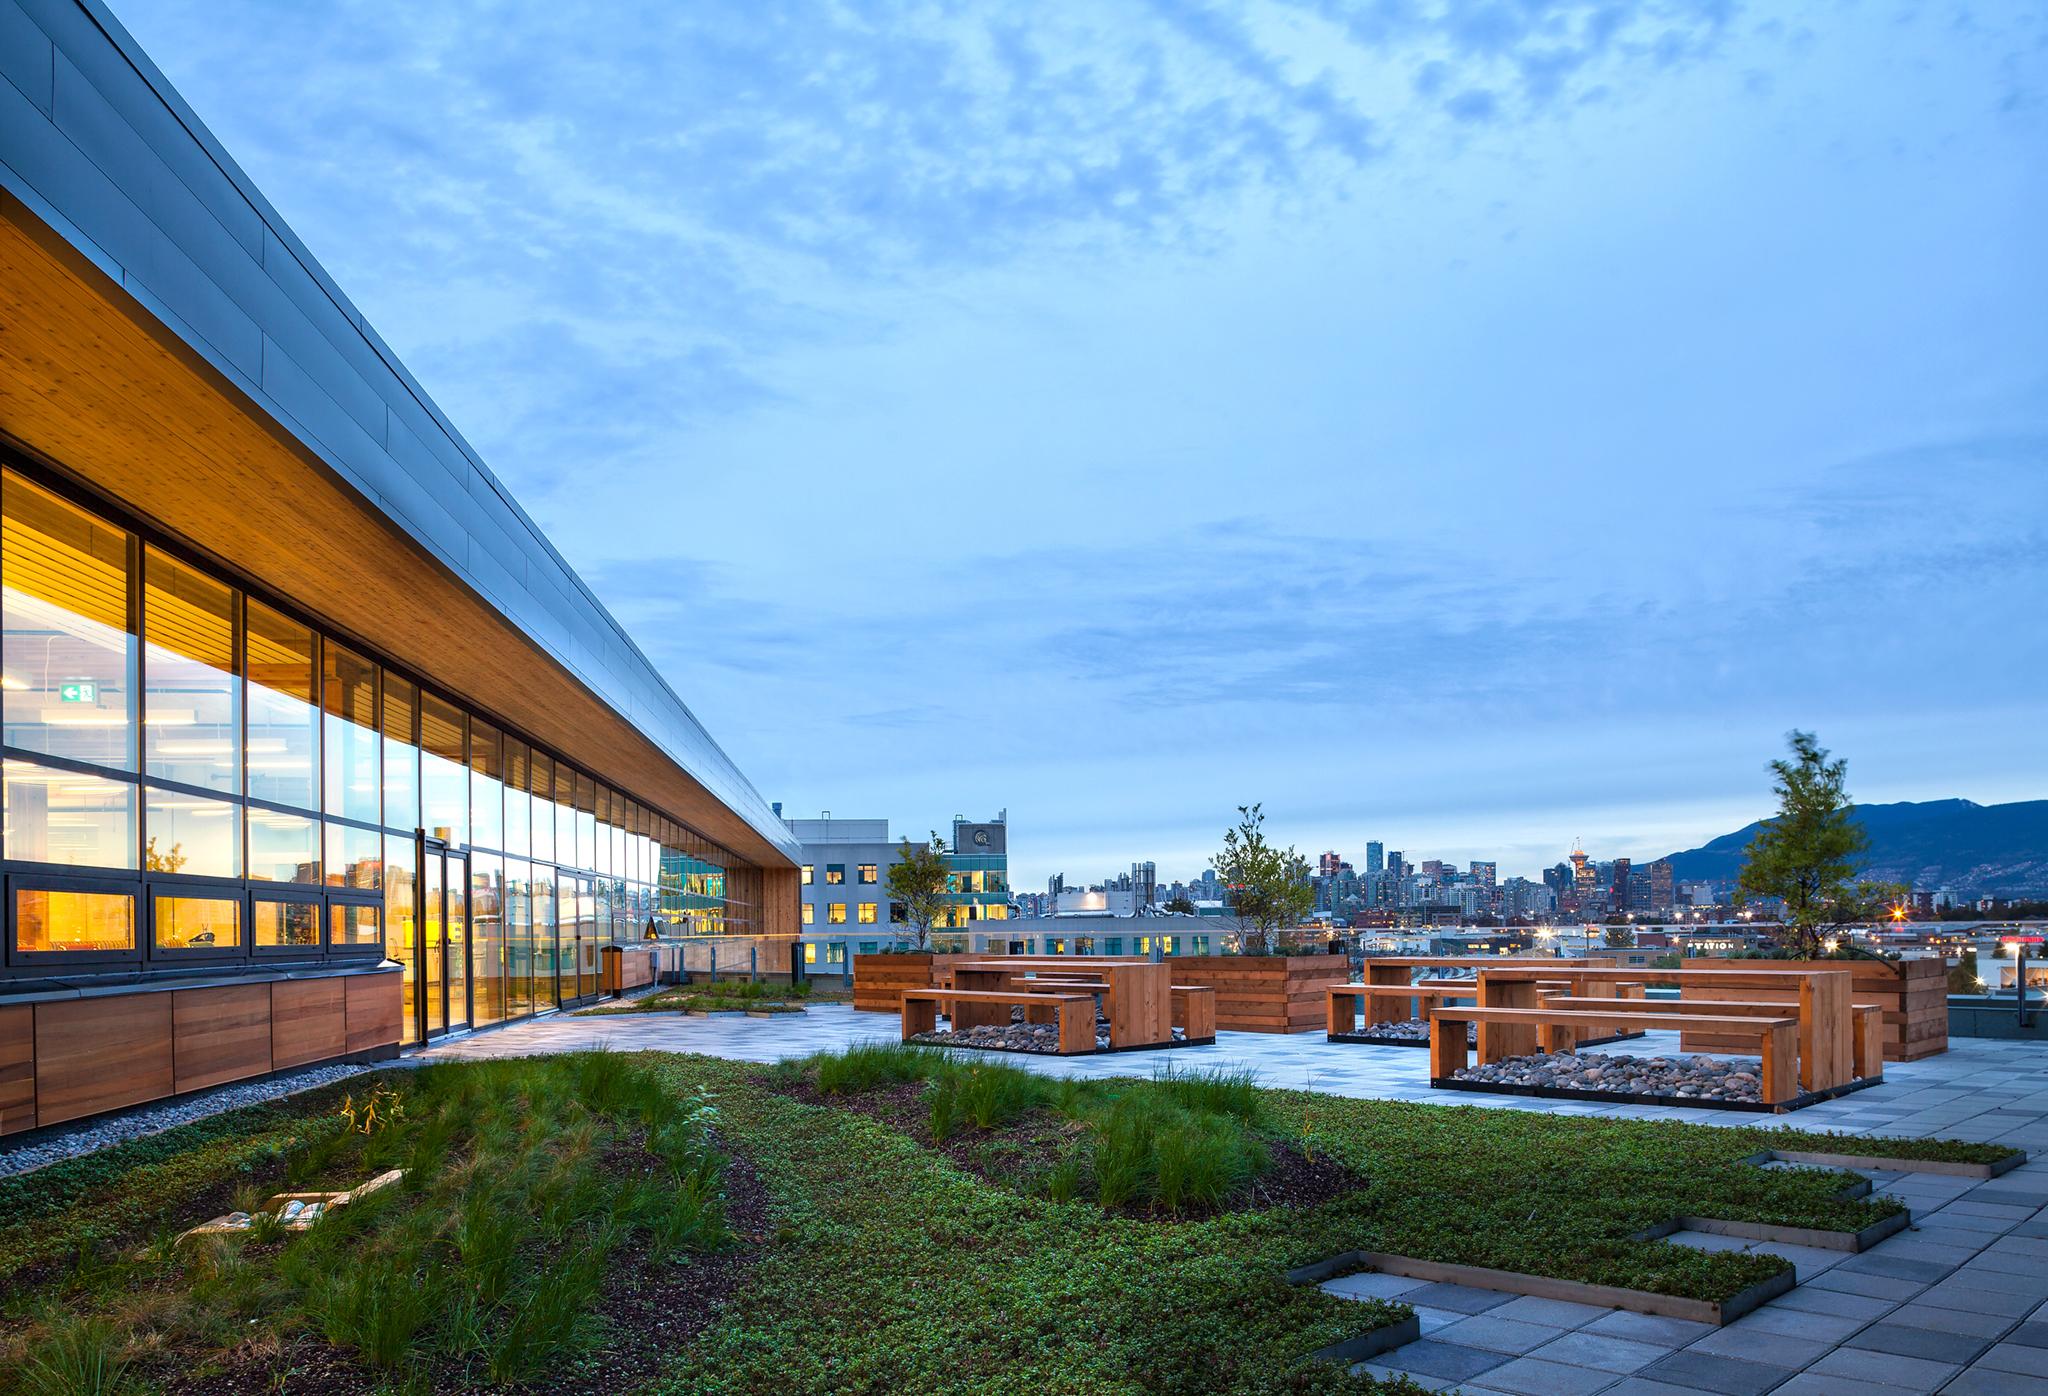 North America Vancouver, Canada Head Office. Hatfield Consultants # – Harbourside Drive North Vancouver, BC, CANADA V7P 0A3. Tel: +